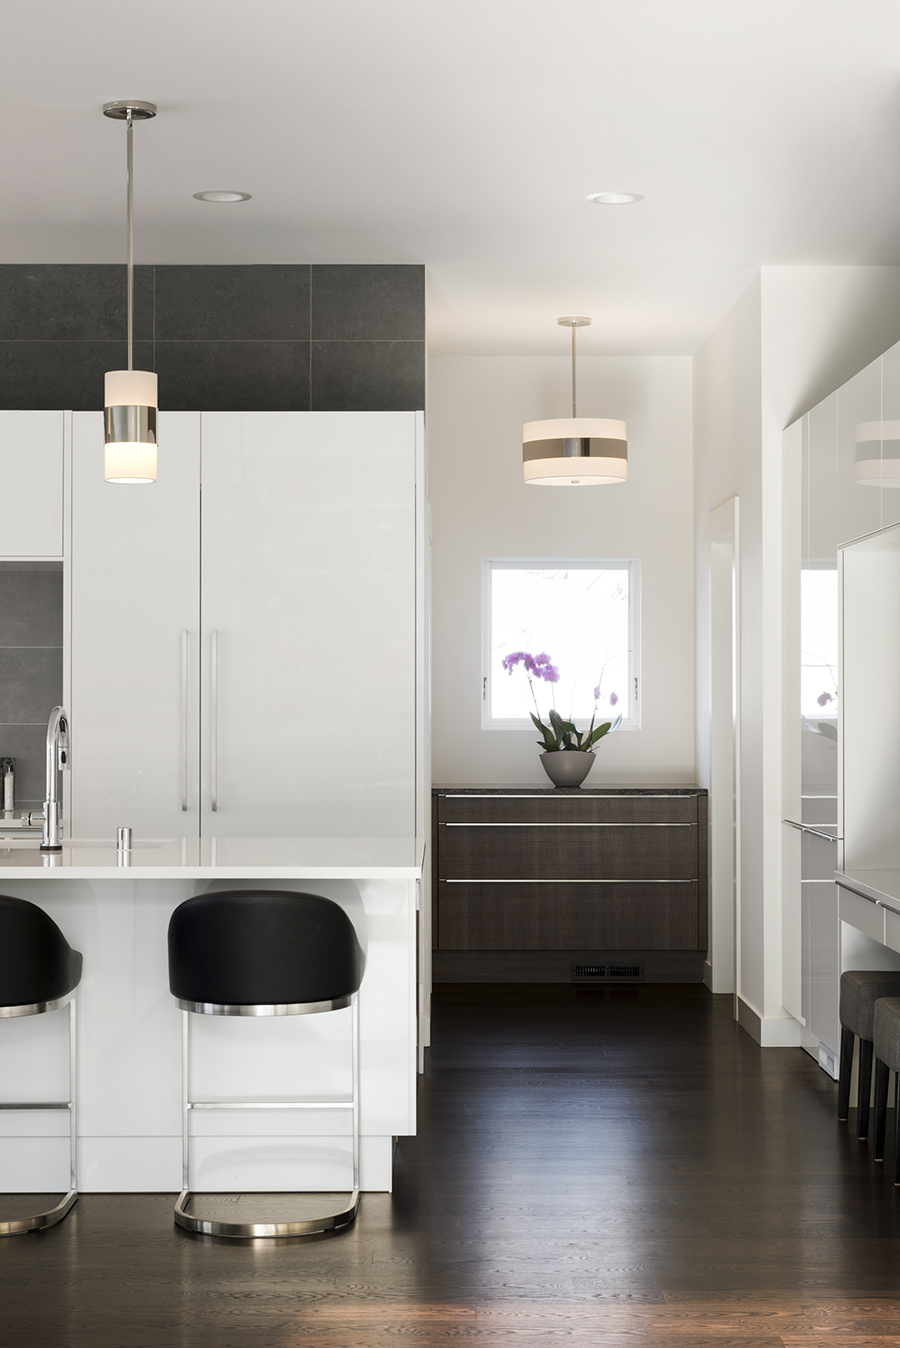 Belle Kitchen Interior Design Designer Luxury Minnesota MN Mpls Minneapolis St Paul Twin Cities8.jpg